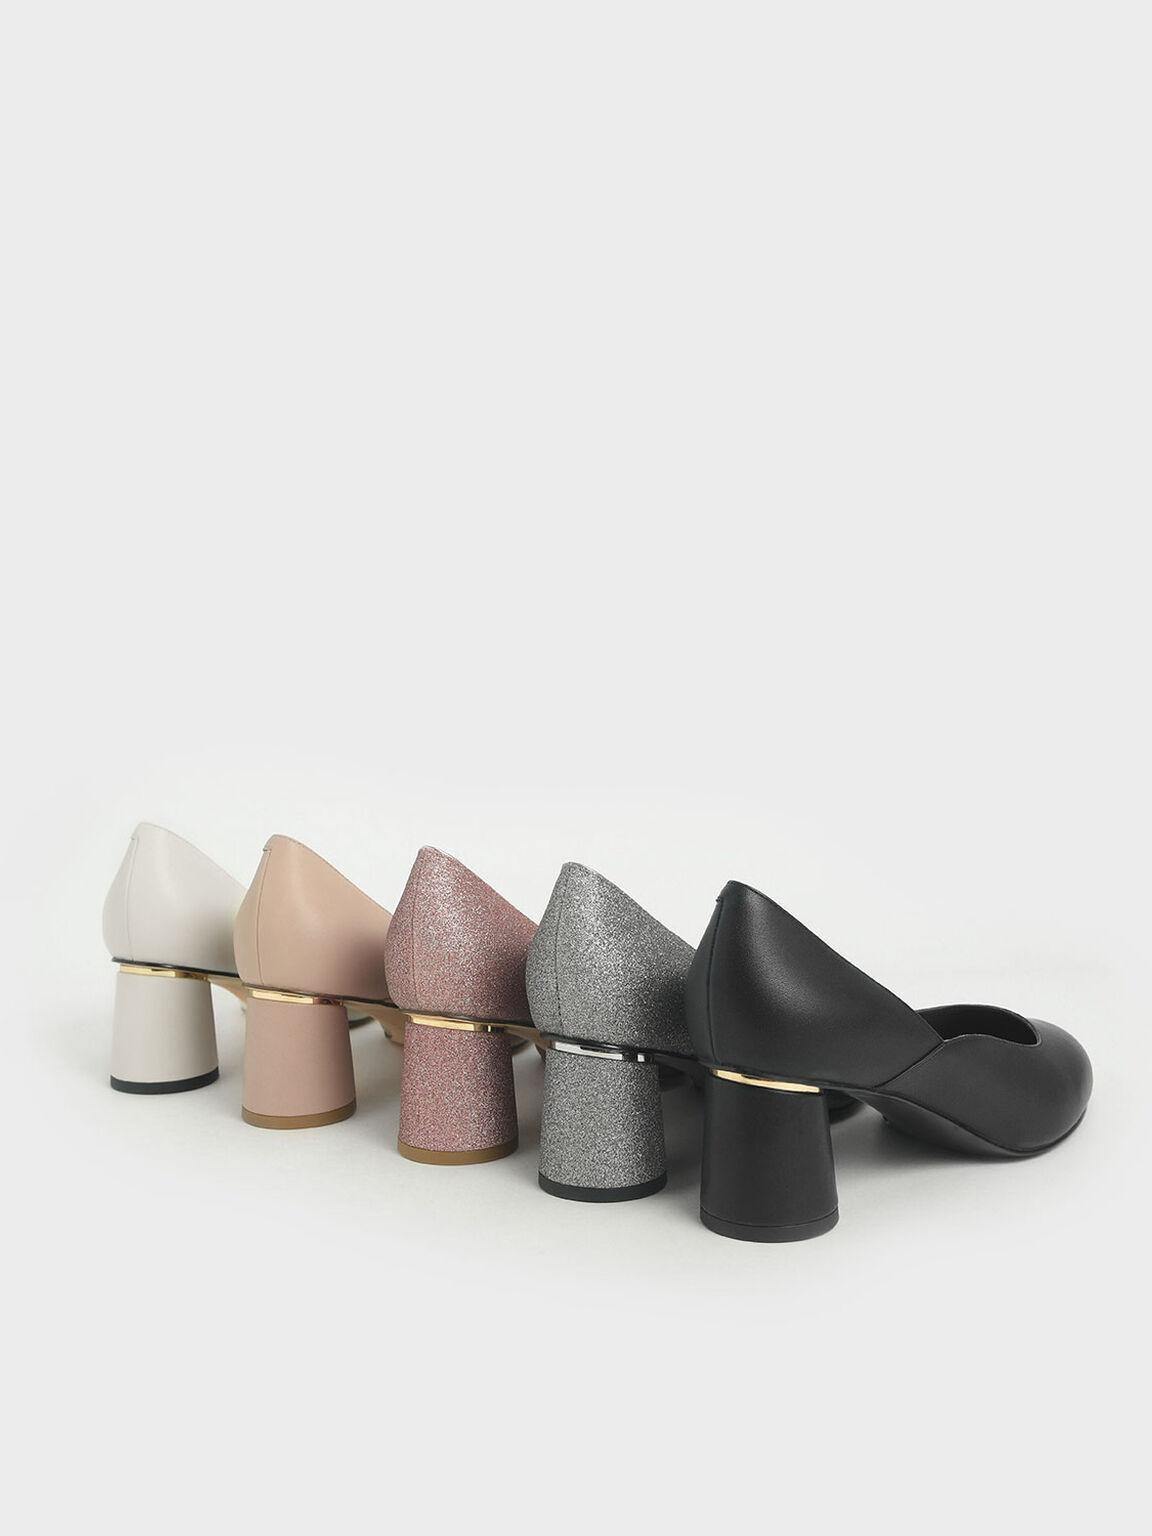 Cylindrical Heel Pumps, Black, hi-res